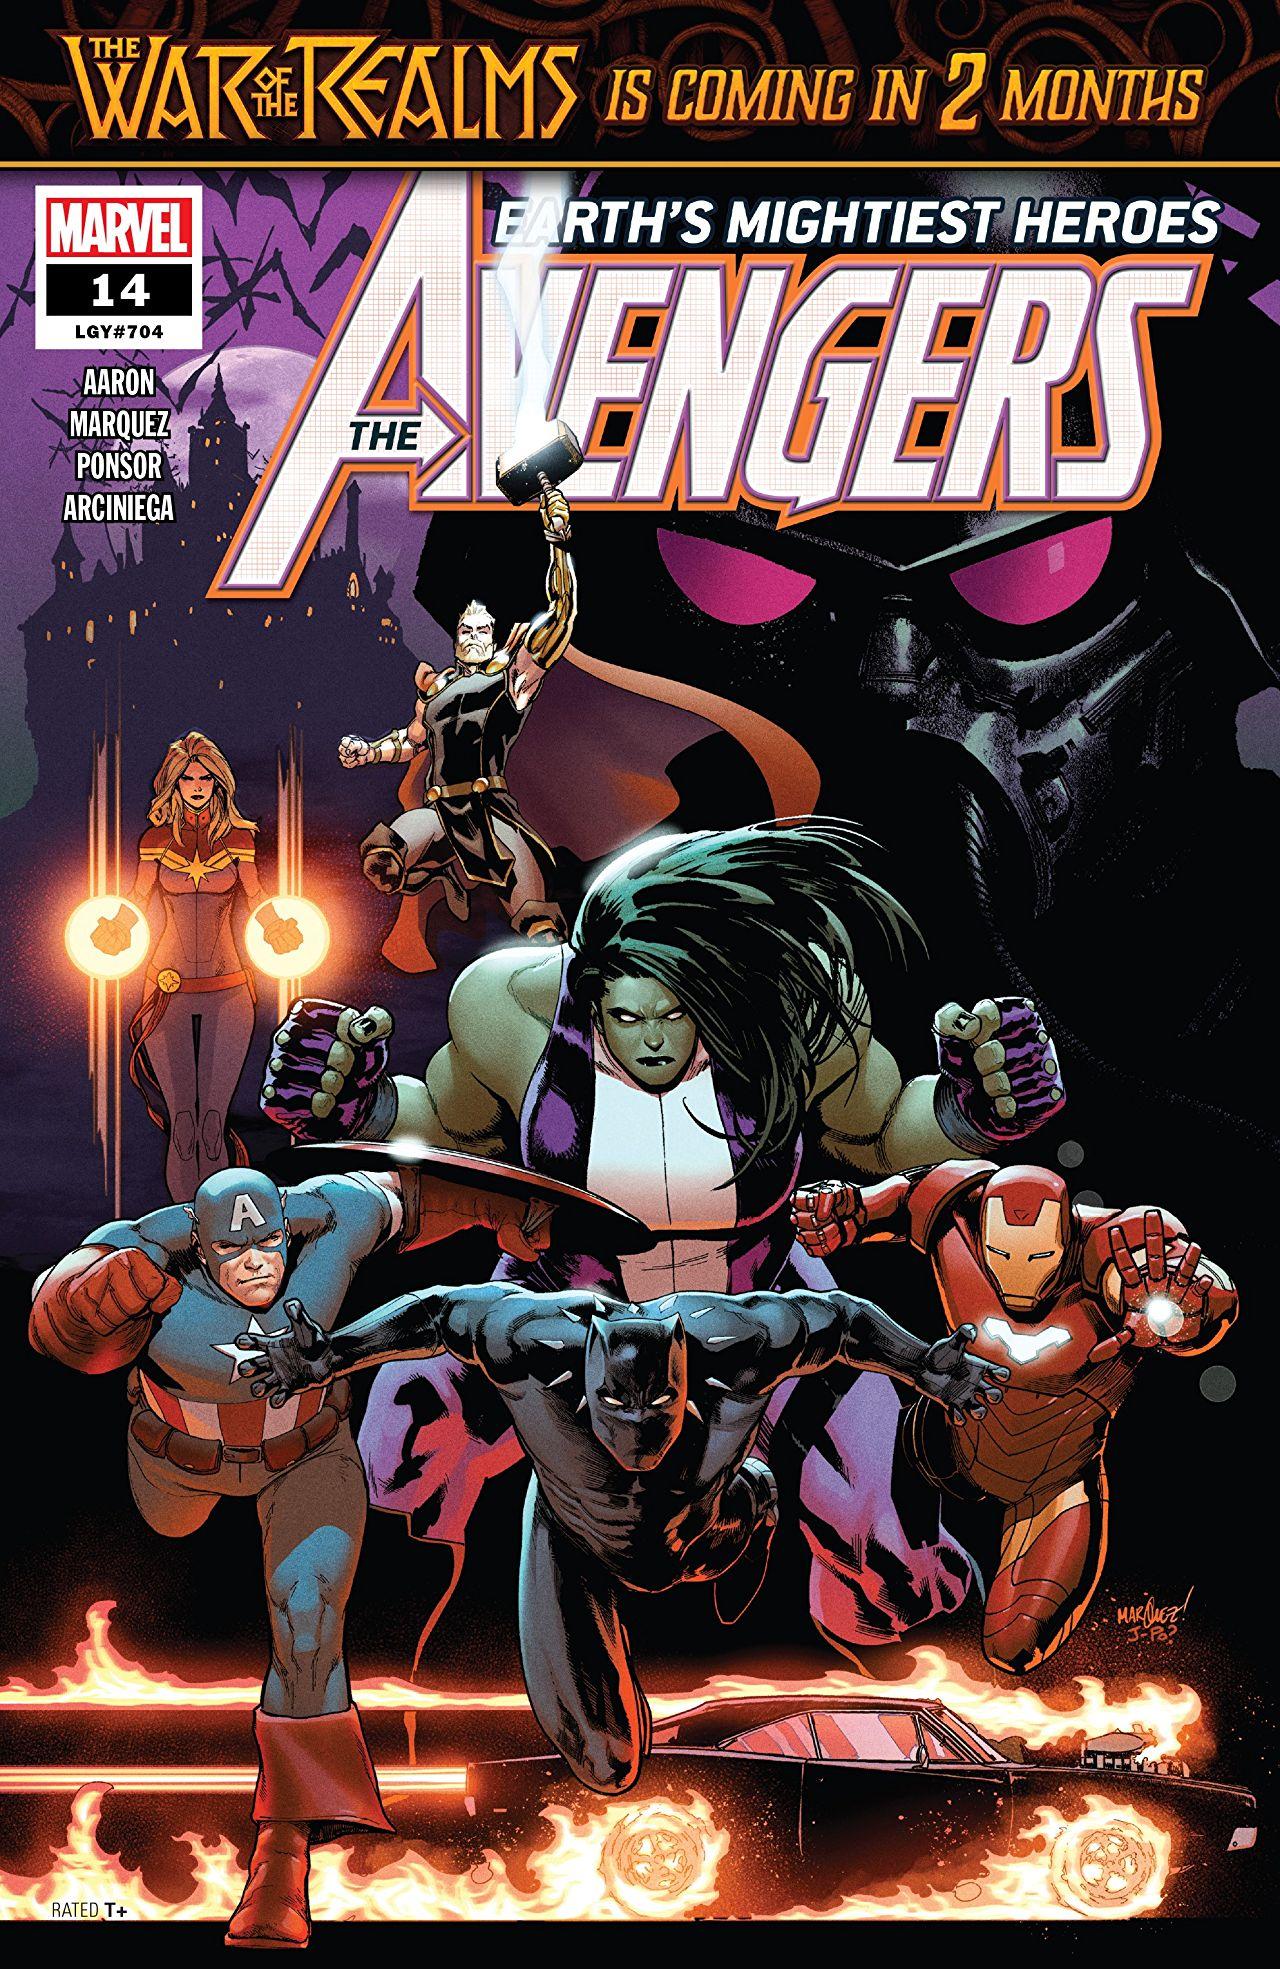 Avengers 14 - WAR OF THE VAMPIRES PART 1